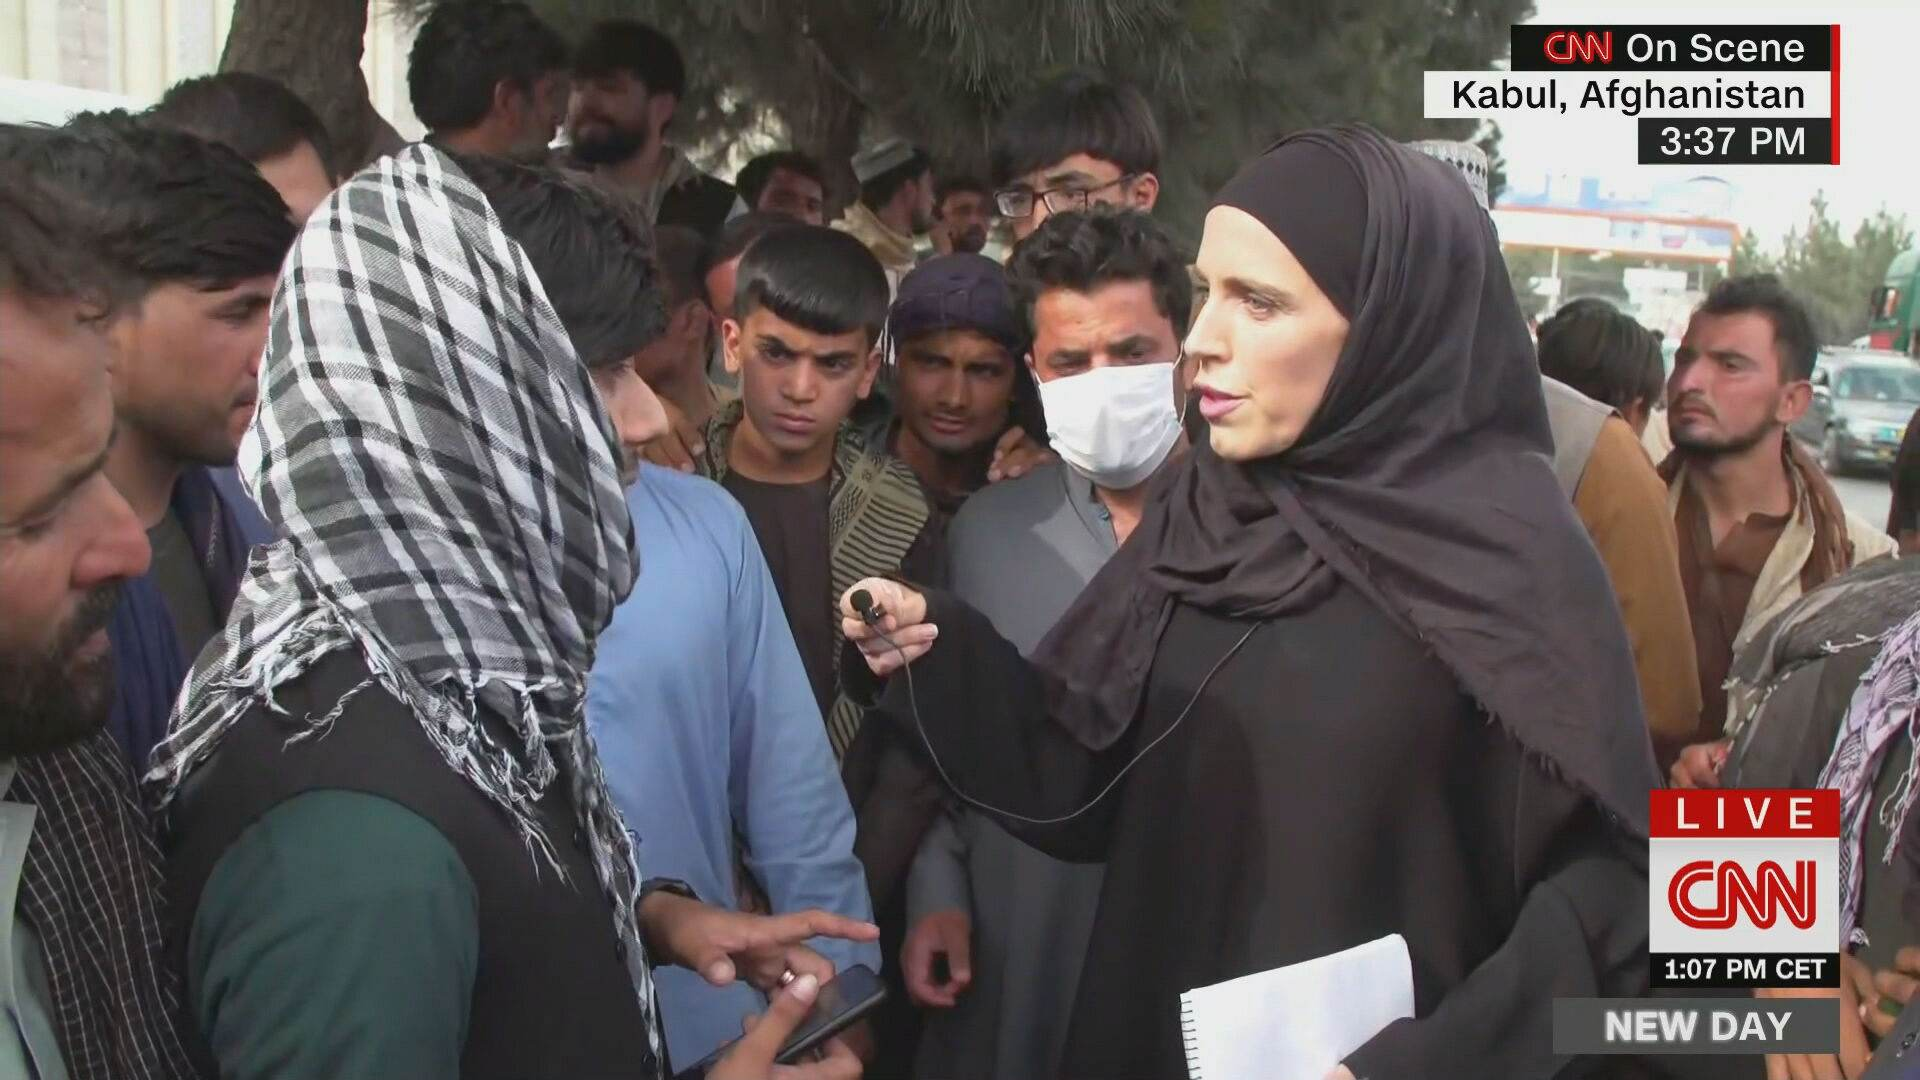 A correspondente da CNN Internacional Clarissa Ward em Cabul